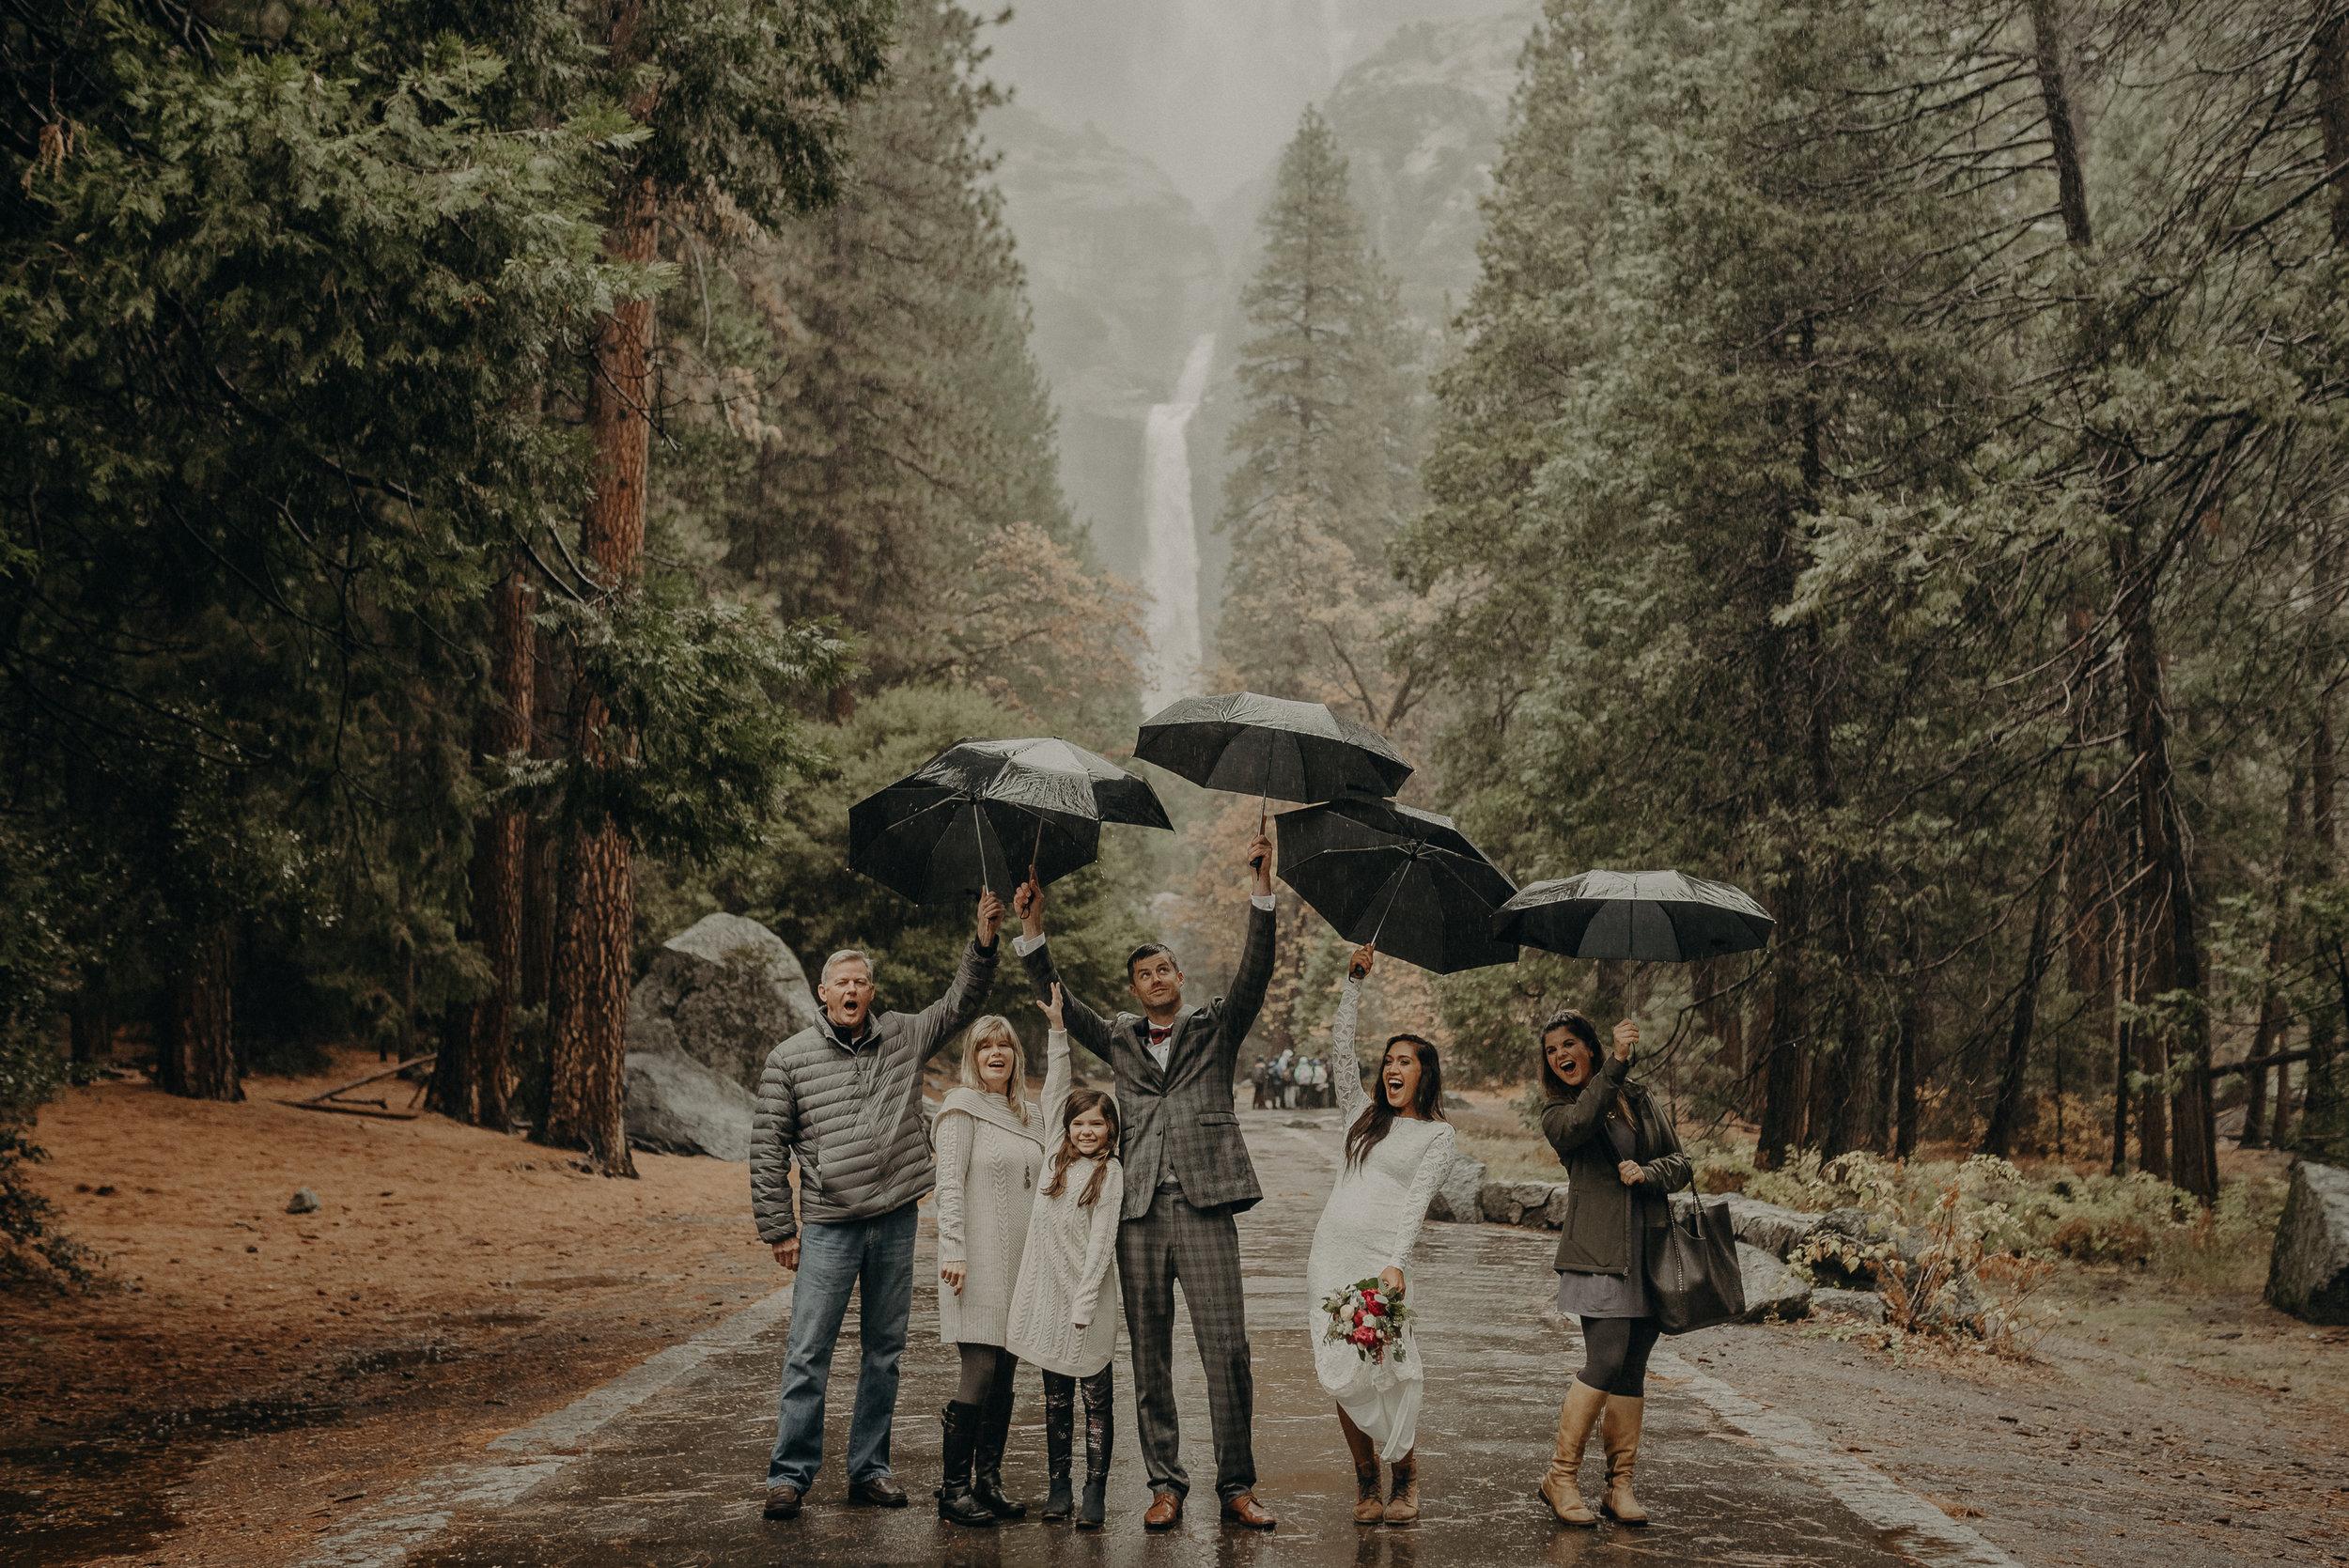 Isaiah + Taylor Photography - Yosemite Elopement - Los Angeles Wedding Photographer-24.jpg